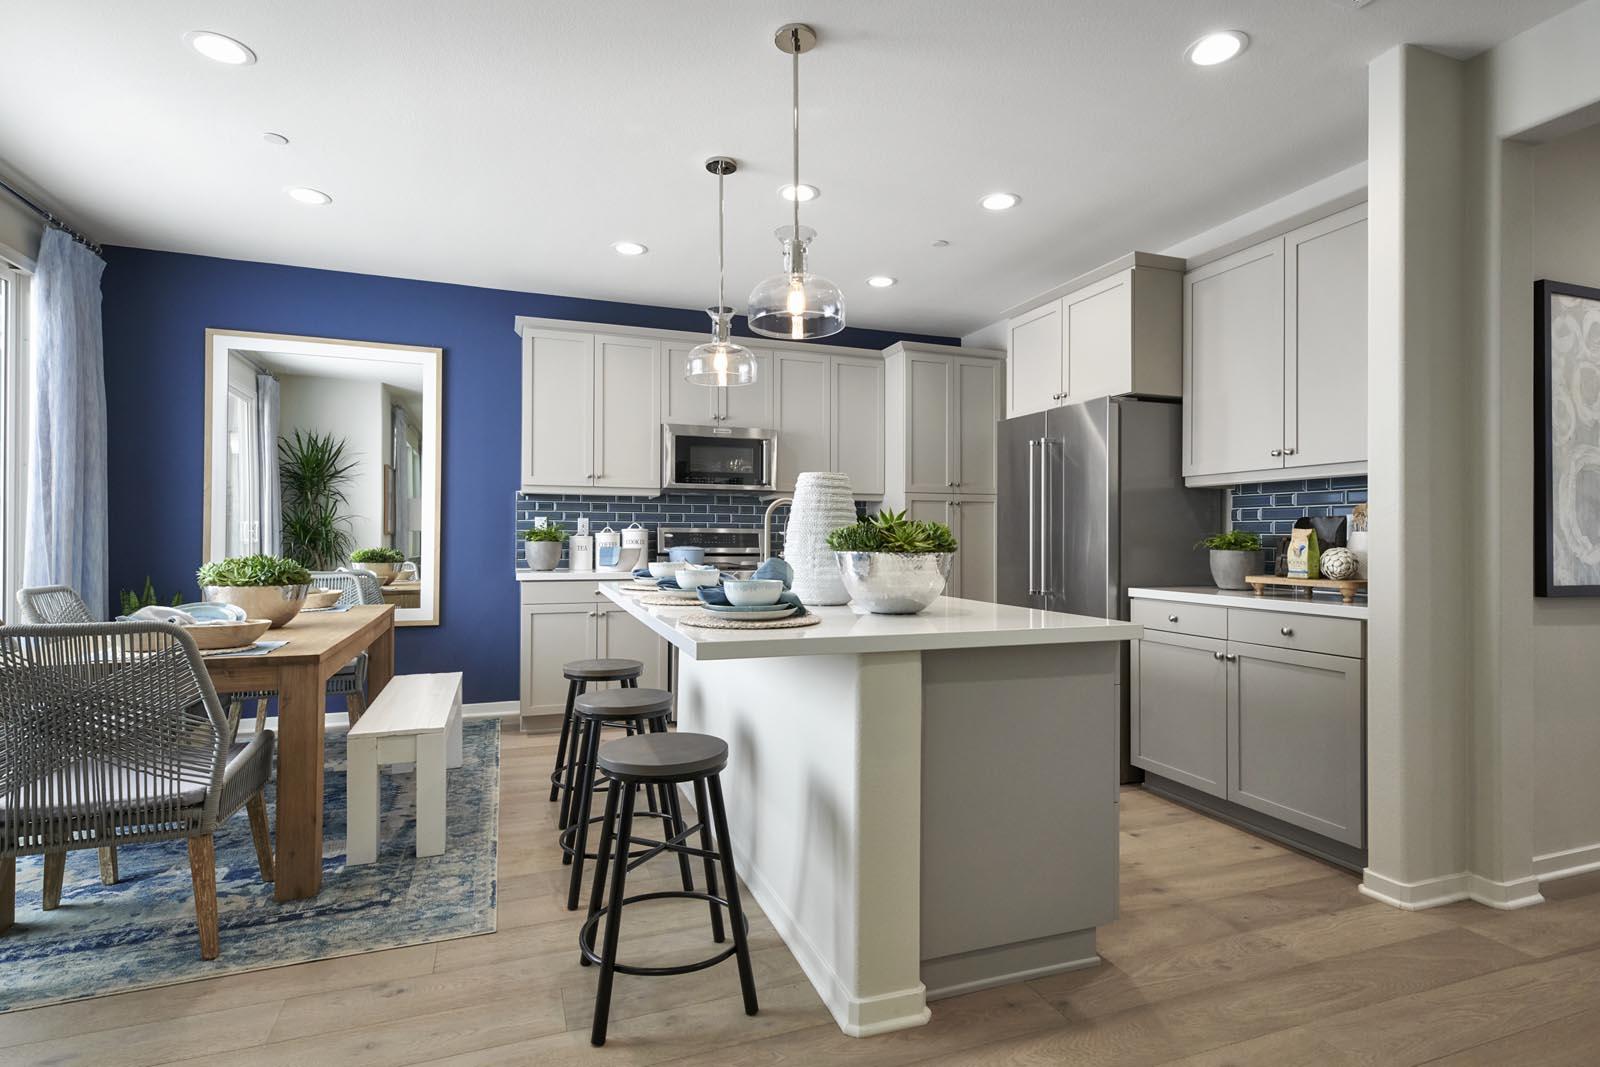 Kitchen | Residence 3 | Lumin | New Homes in Rancho Cucamonga, CA | Van Daele Homes